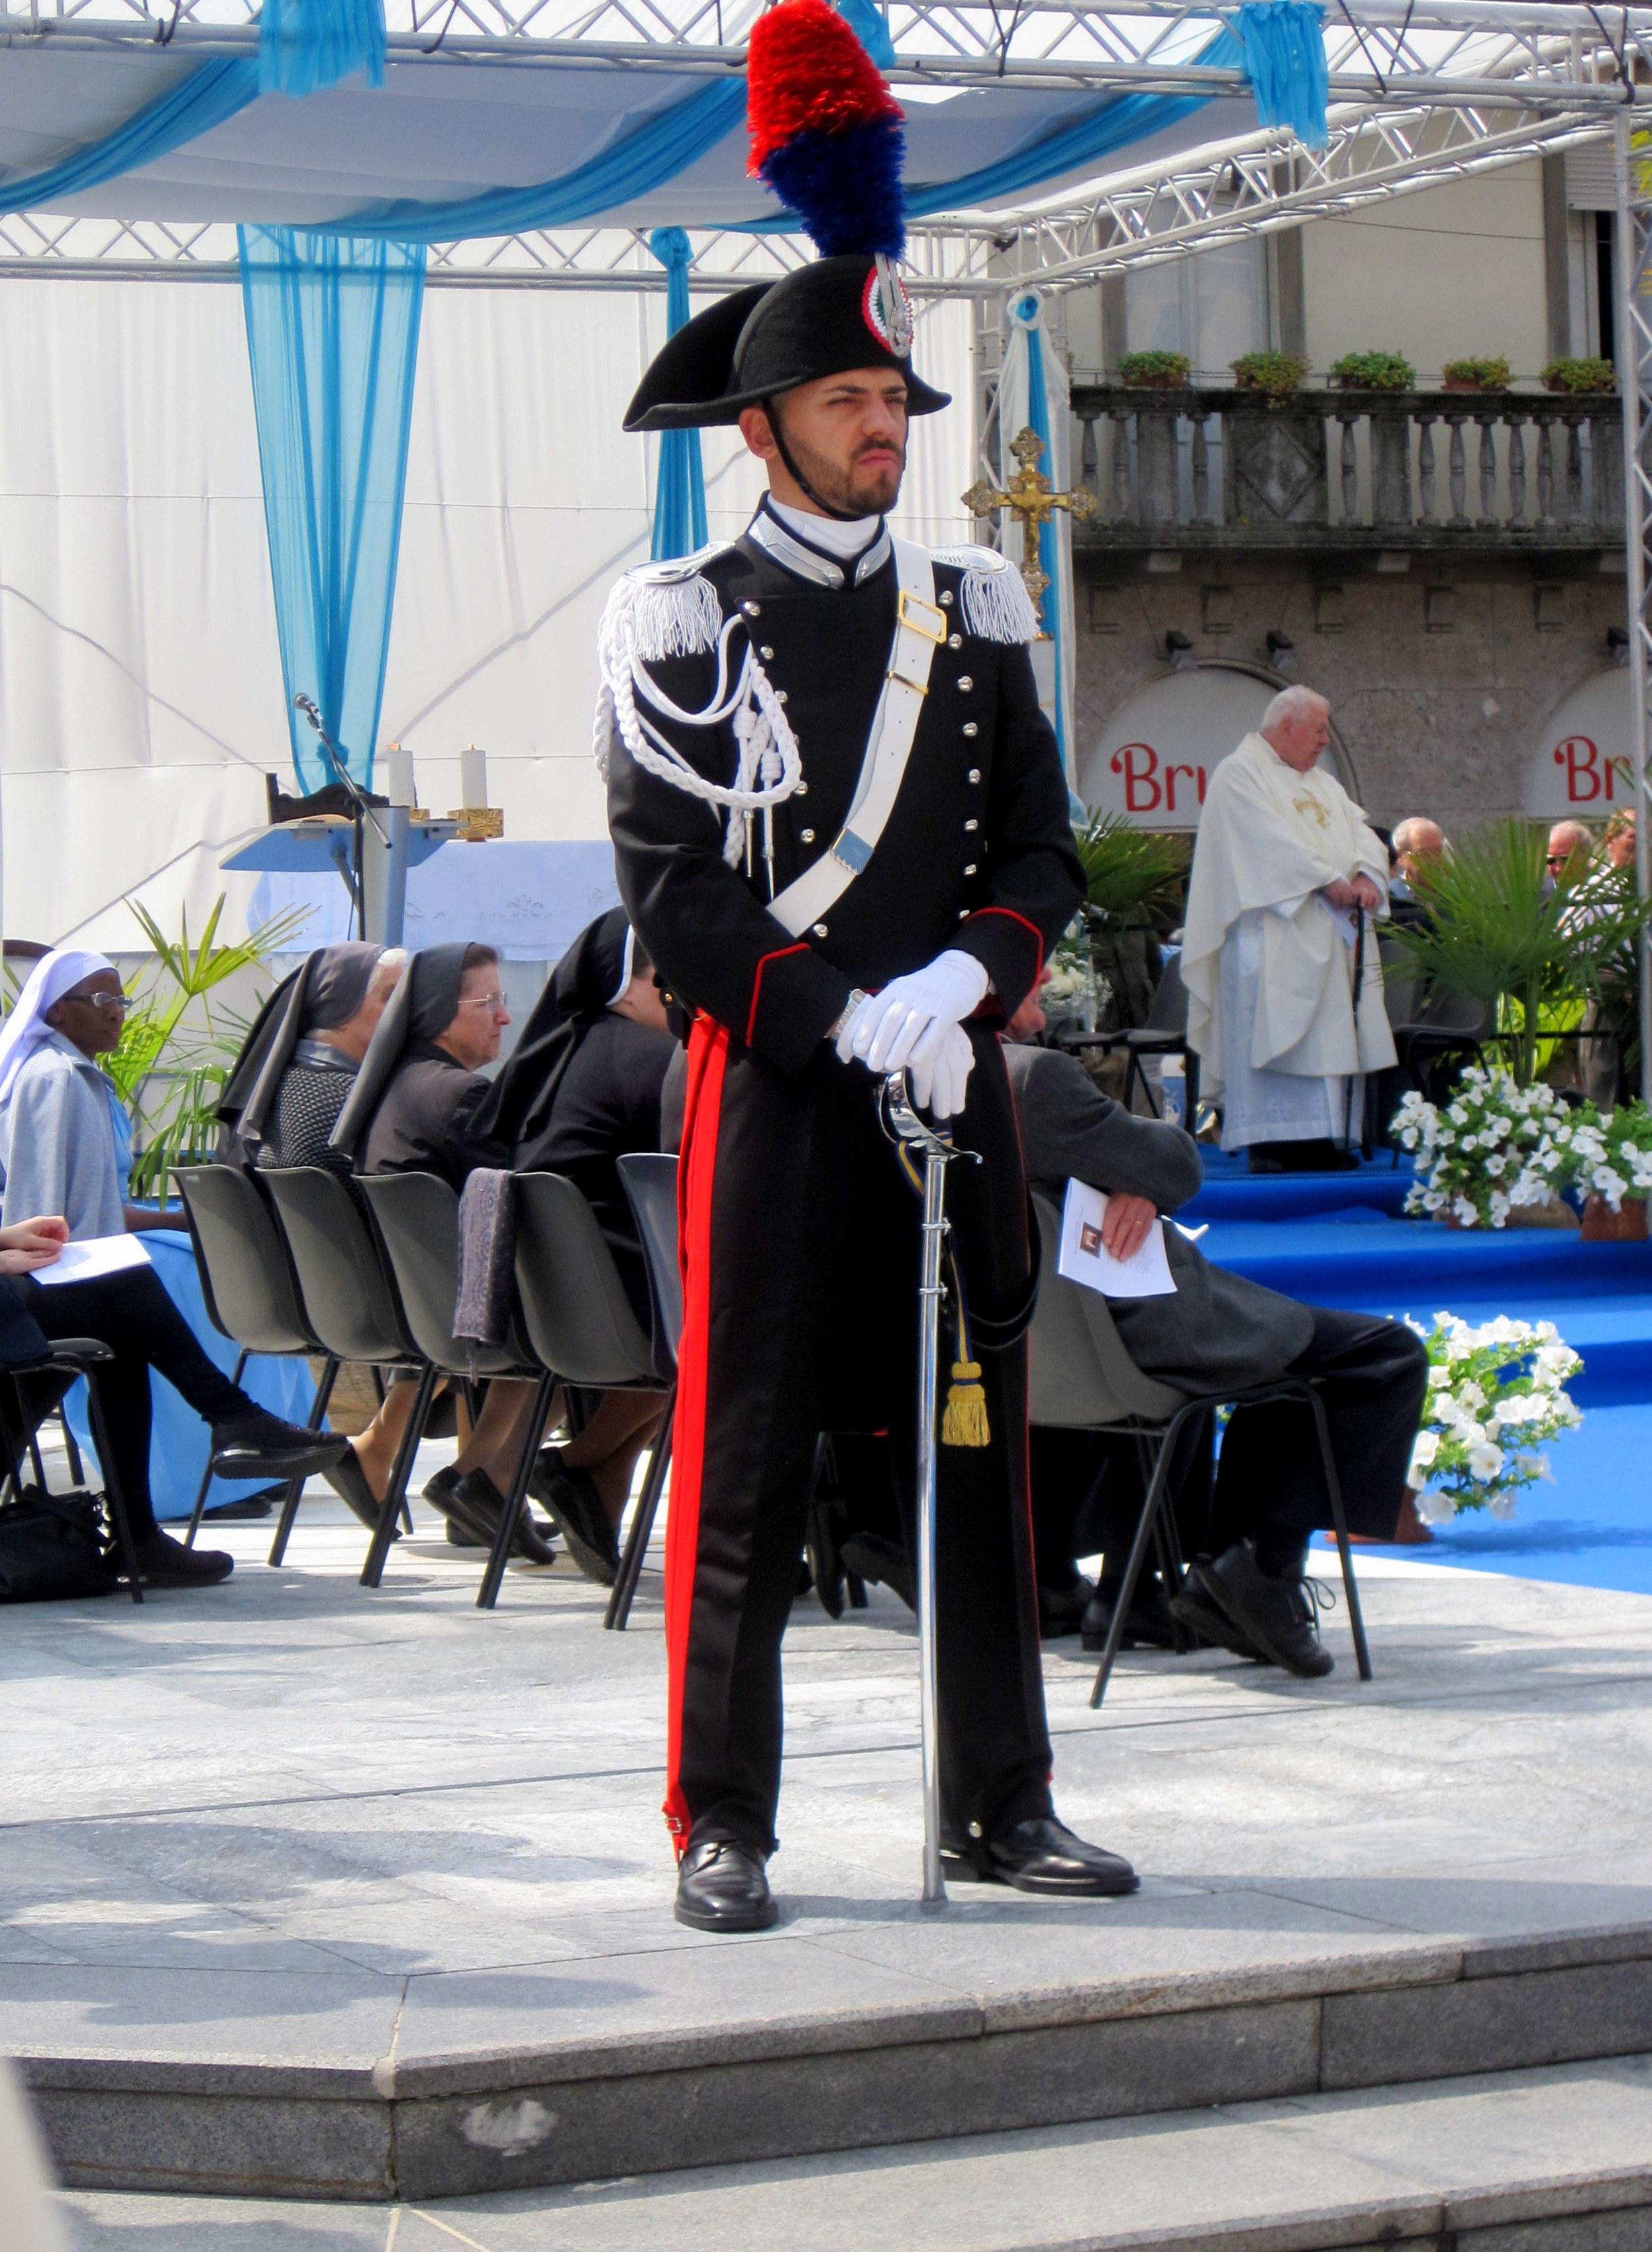 https://upload.wikimedia.org/wikipedia/commons/6/67/Carabiniere_pronto_per_ricevere_l%27arcivescovo_Angelo_Scola.jpg